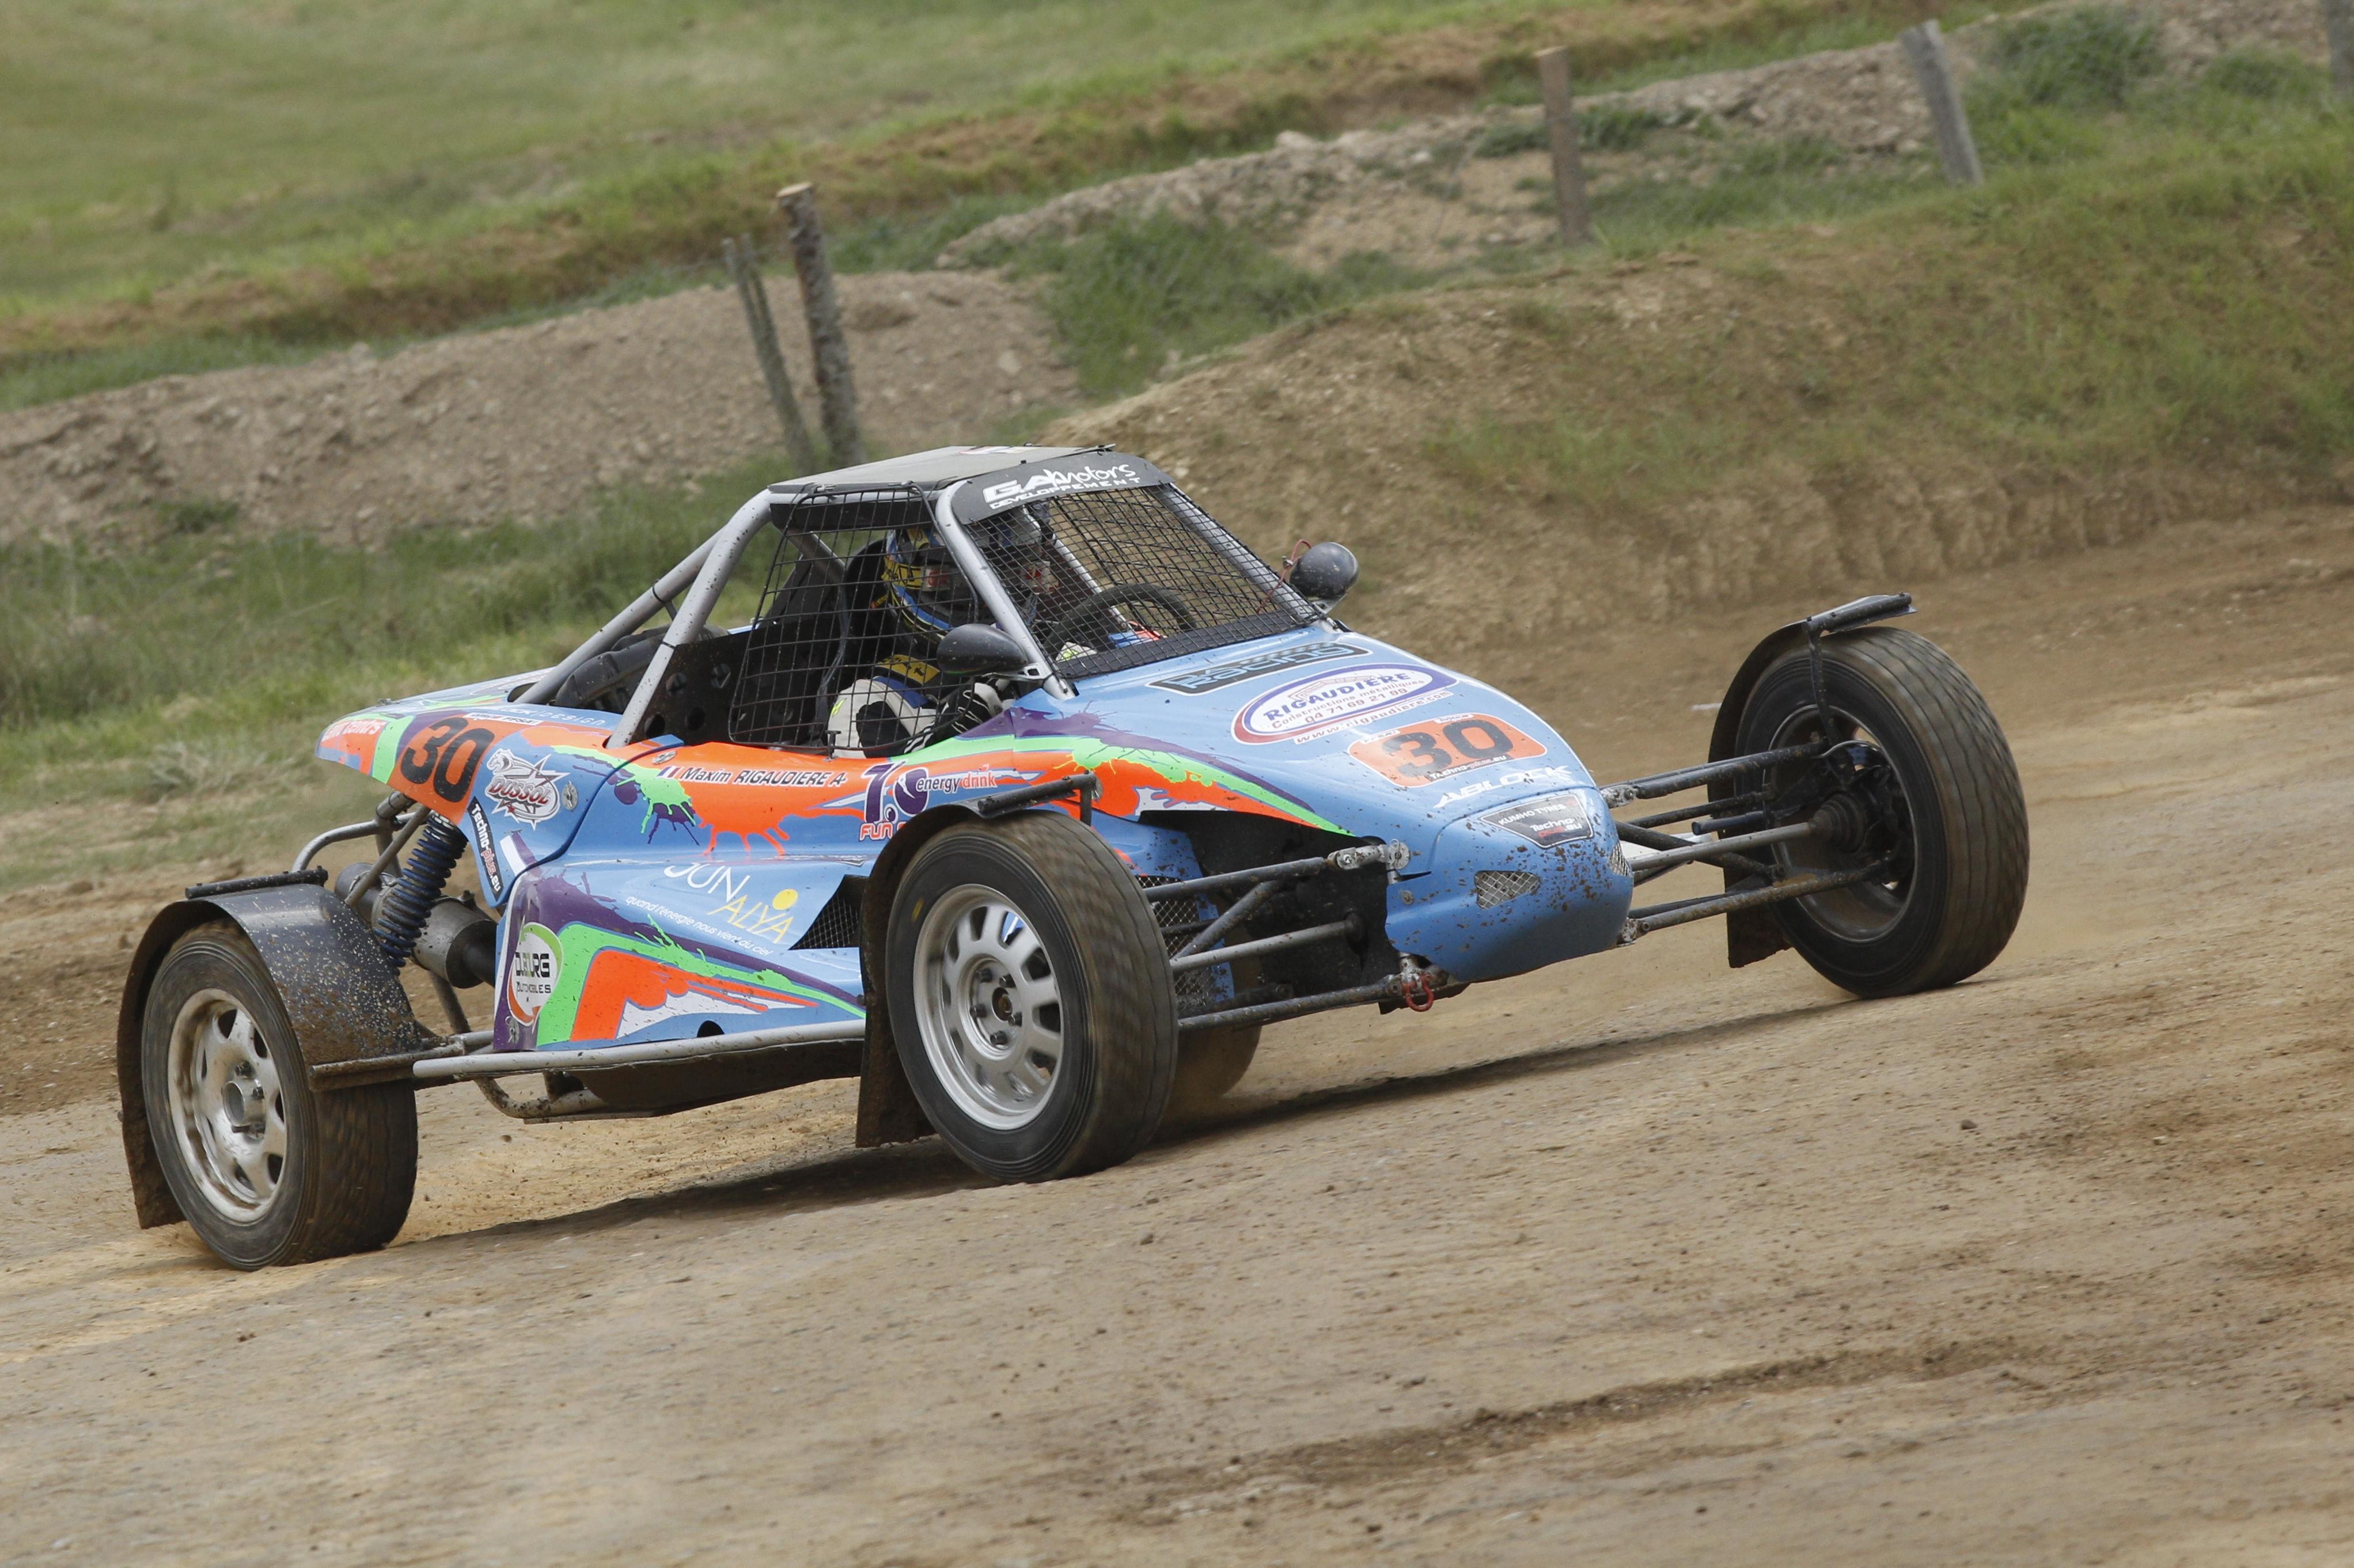 Junior Autocross Car For Sale